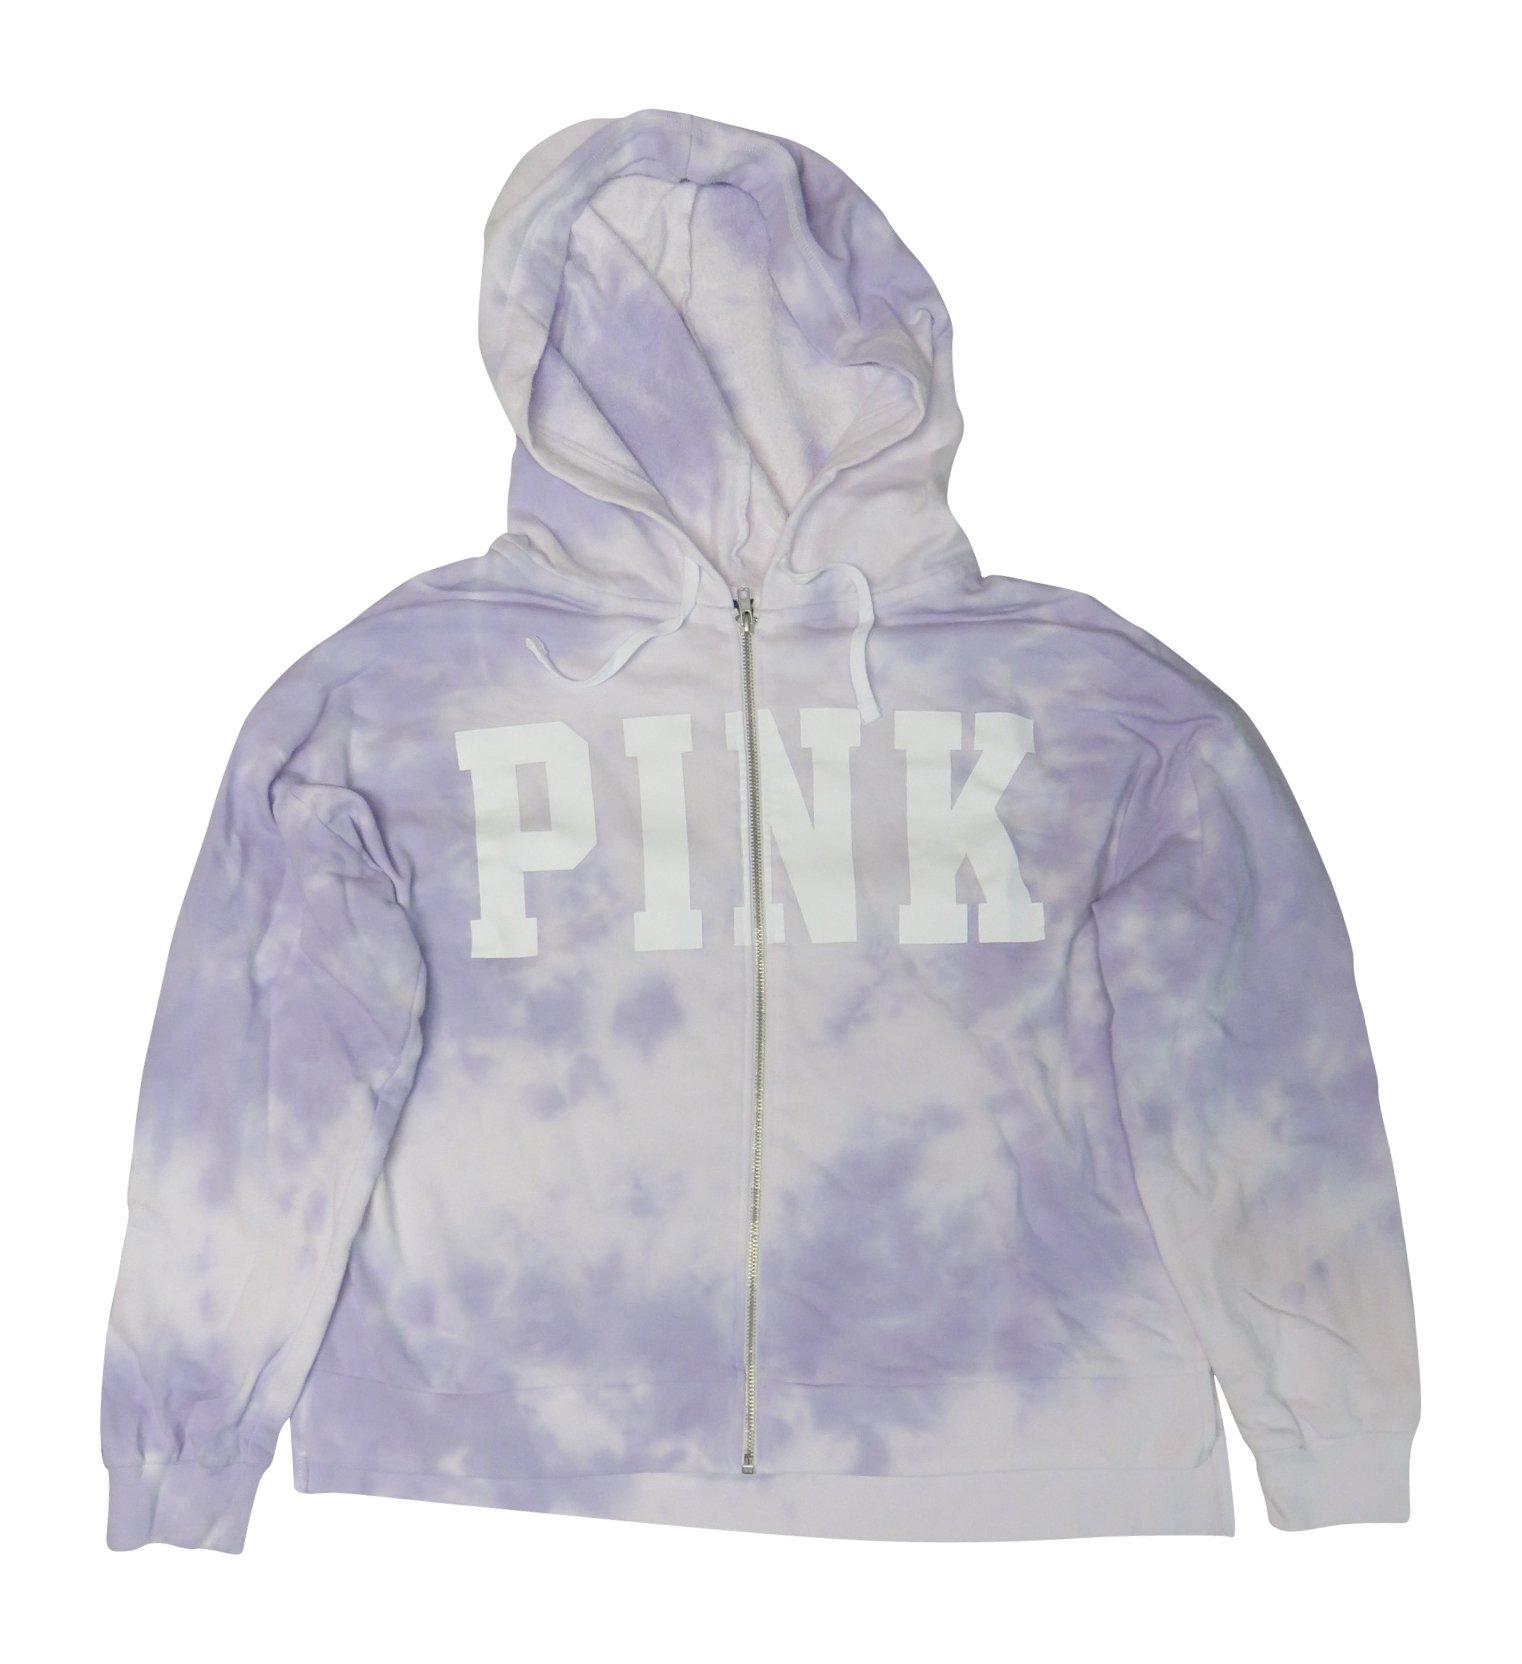 Victoria Secret Co. Victoria's Secret Pink Womens Full Zip Hoodie Purple, Large